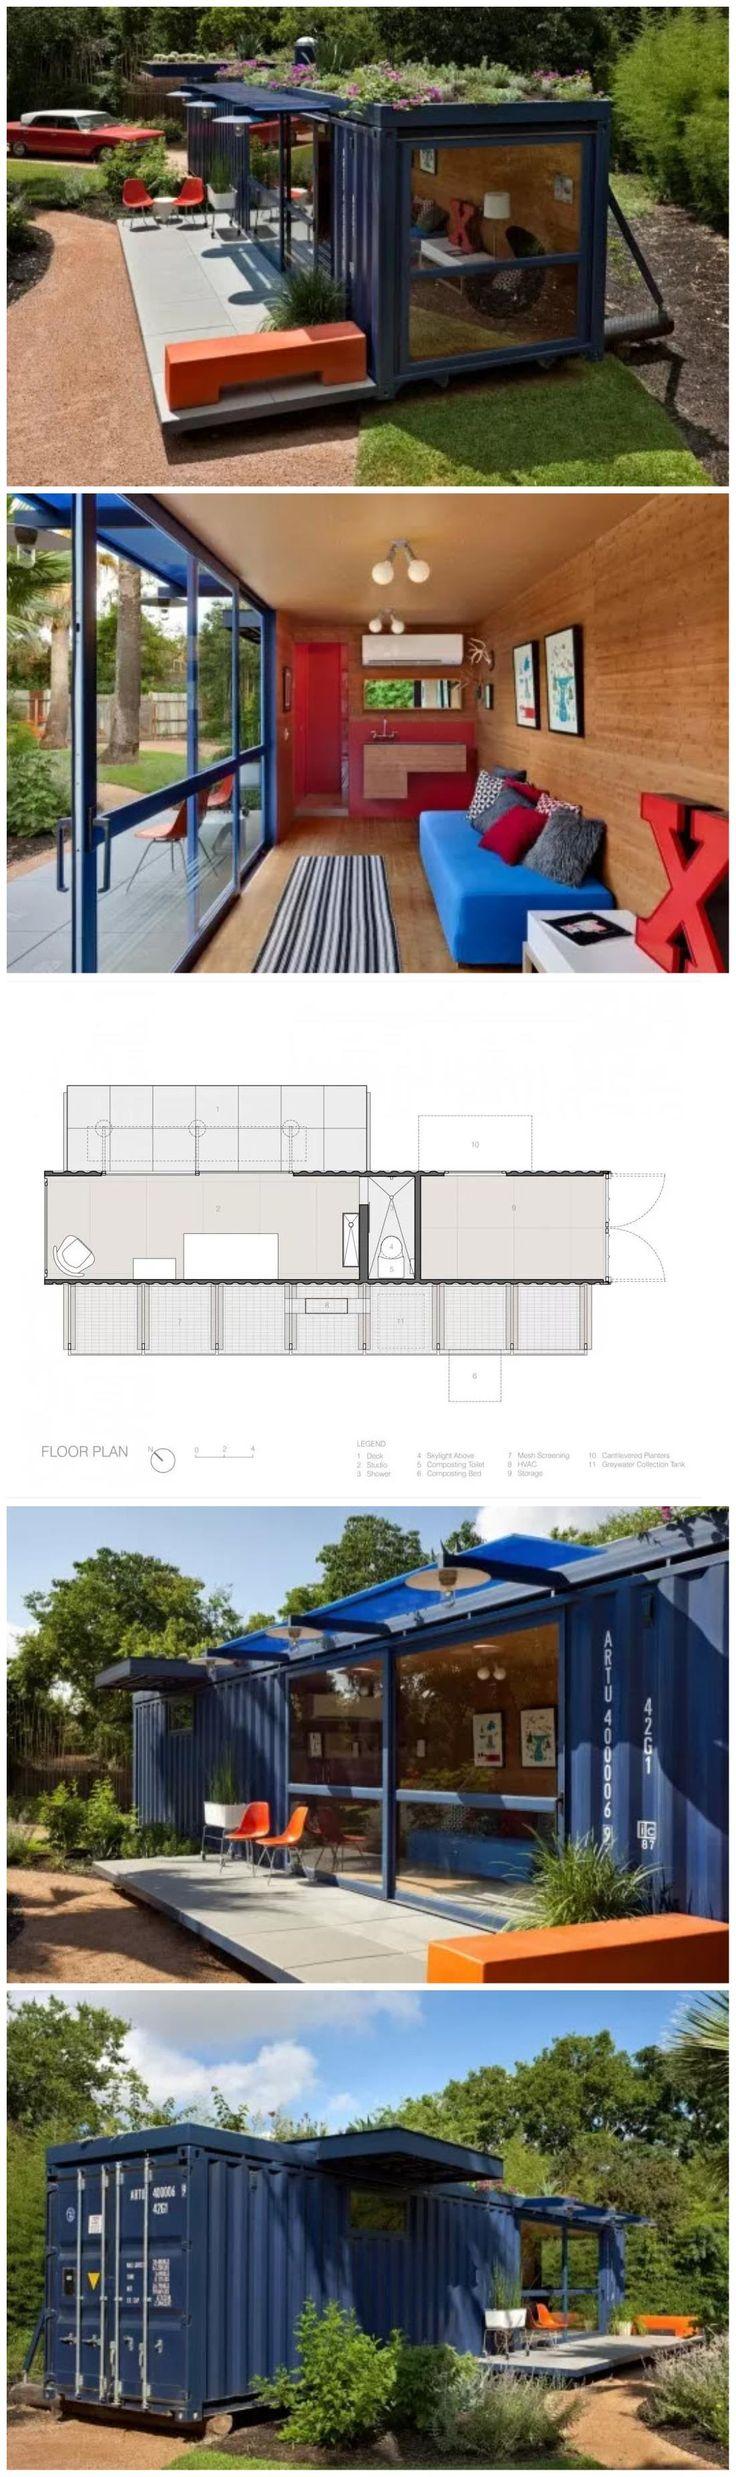 Backyard office/guest house. Add solar panels and plants on roof. Mucho más sobre sostenibilidad en www.solerplanet.com